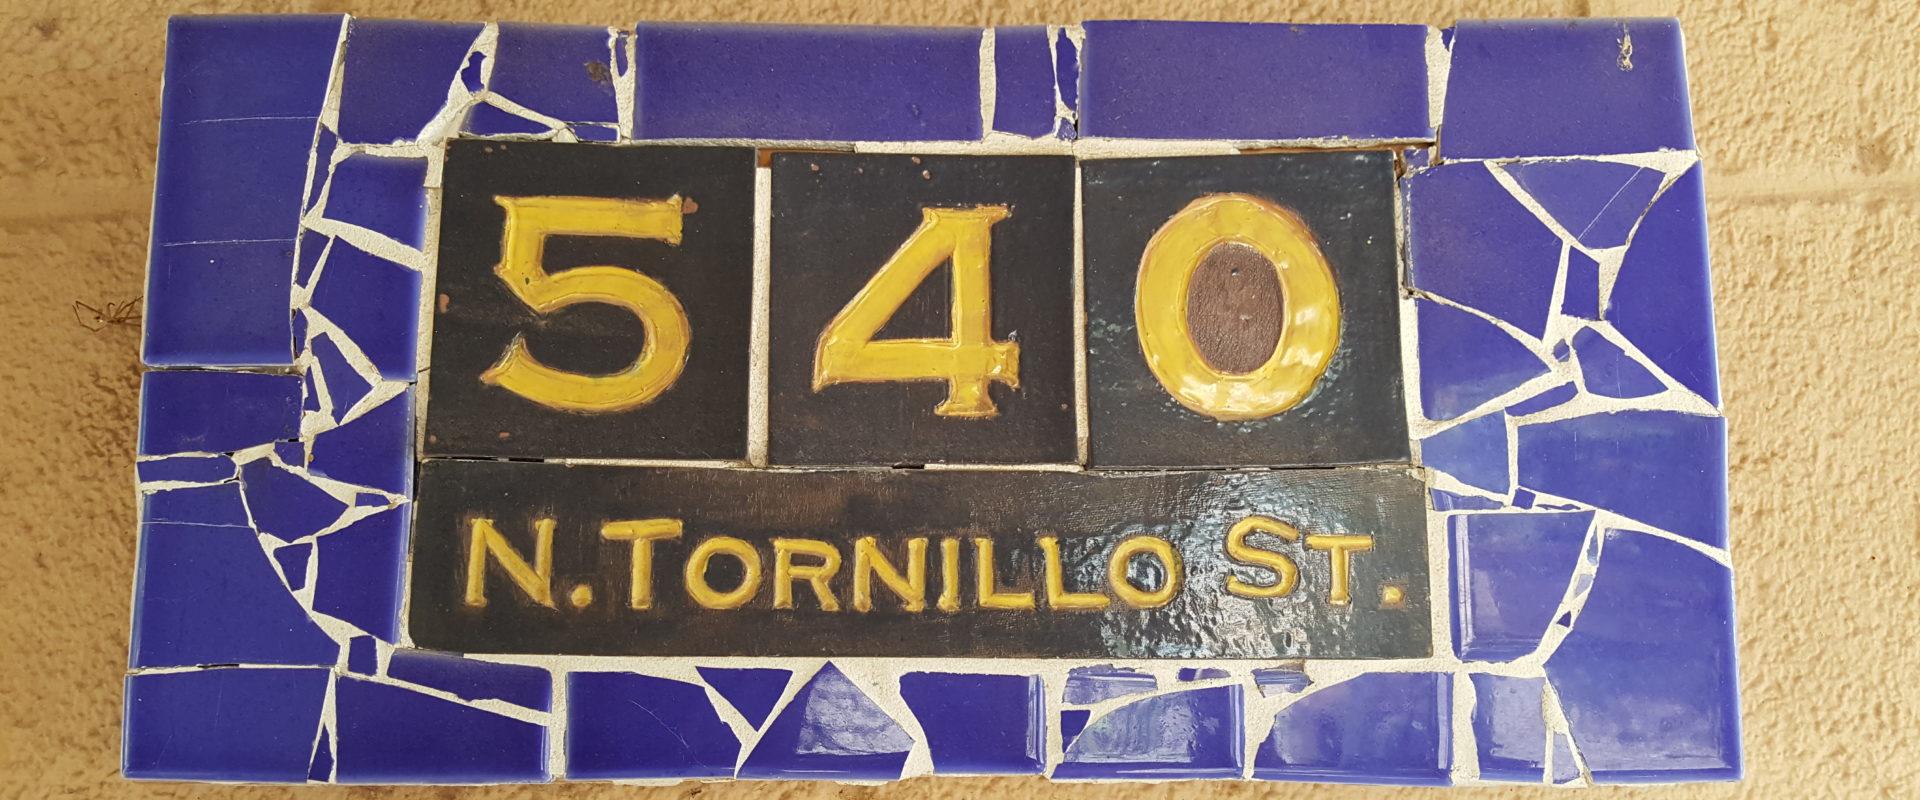 540 N. Tornillo Street